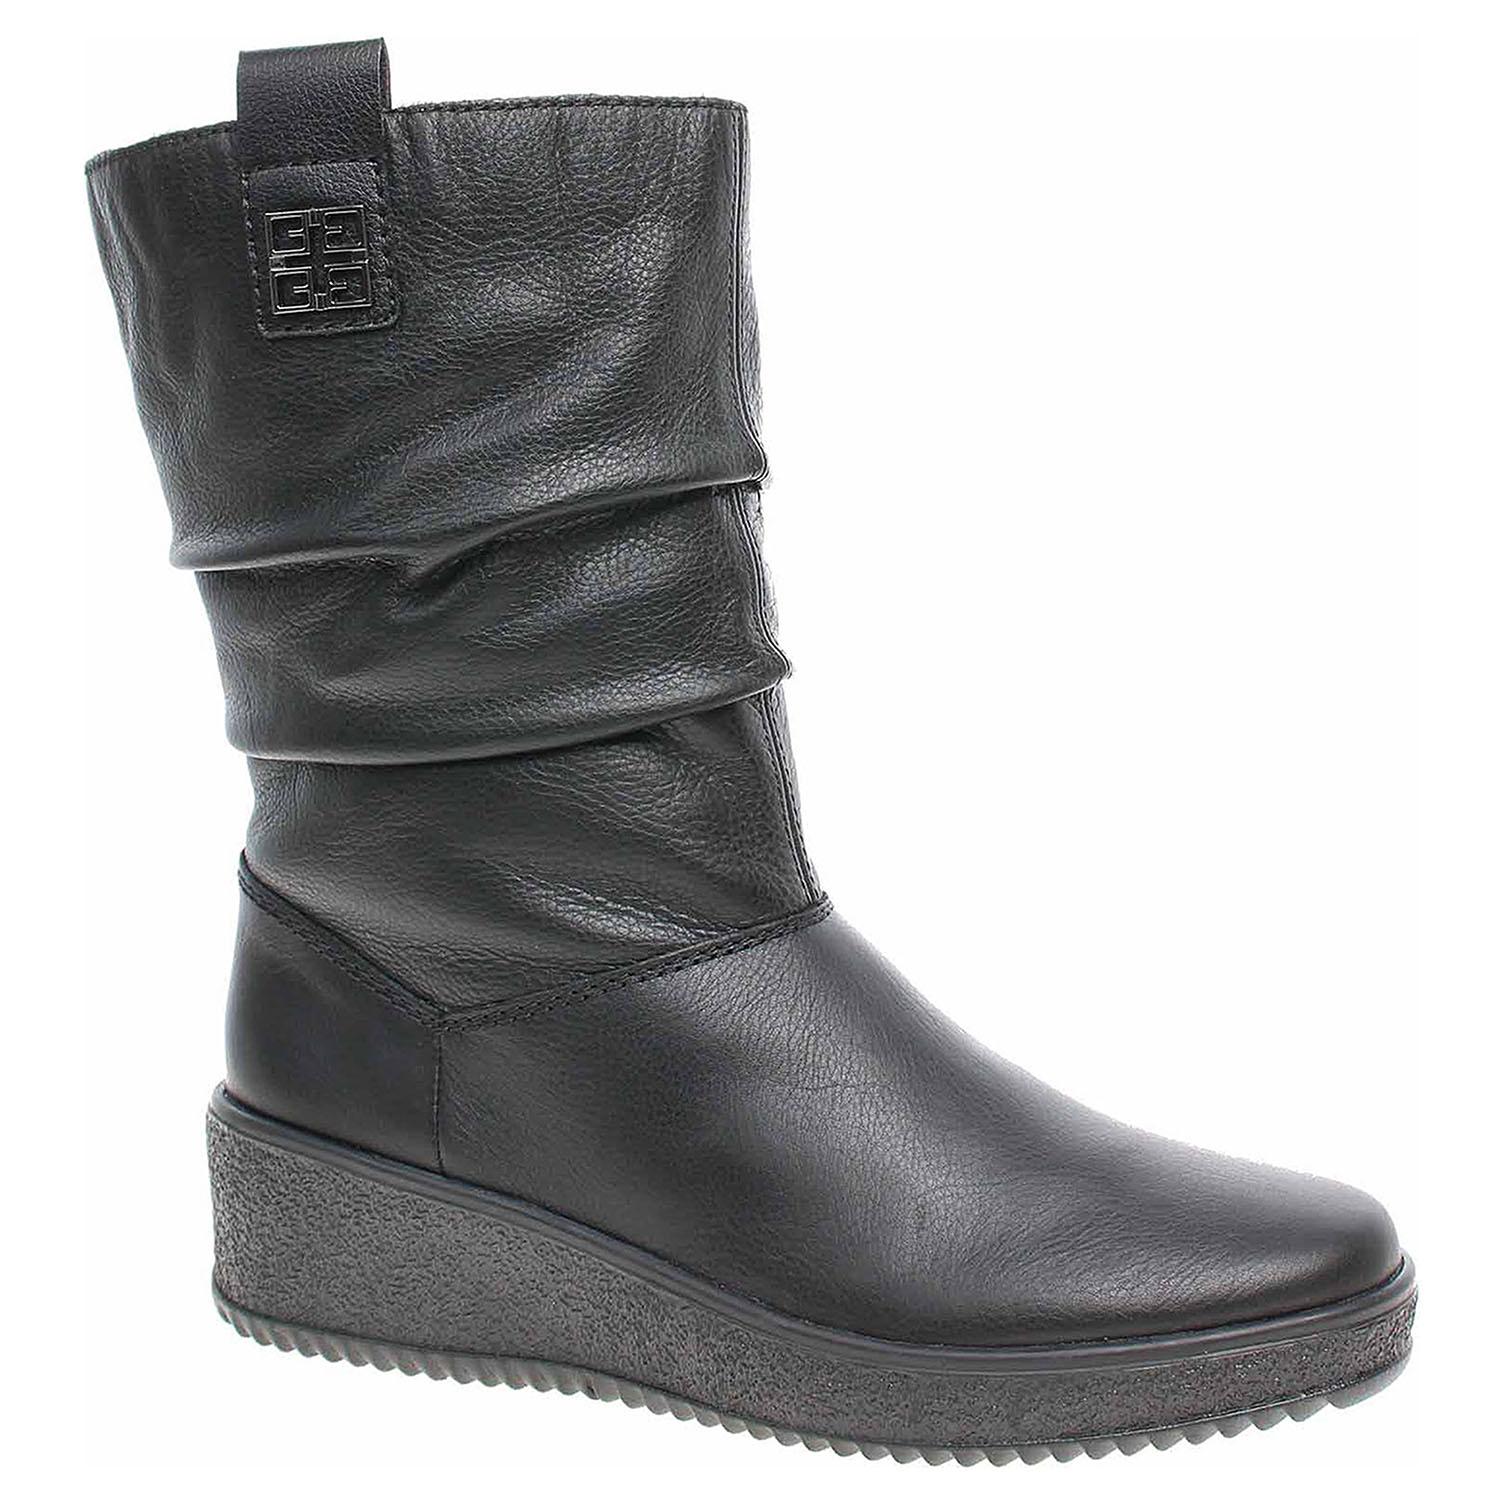 4b45ca6bbf597 Dámske čižmy Rieker Y4473-00 schwarz   REJNOK obuv